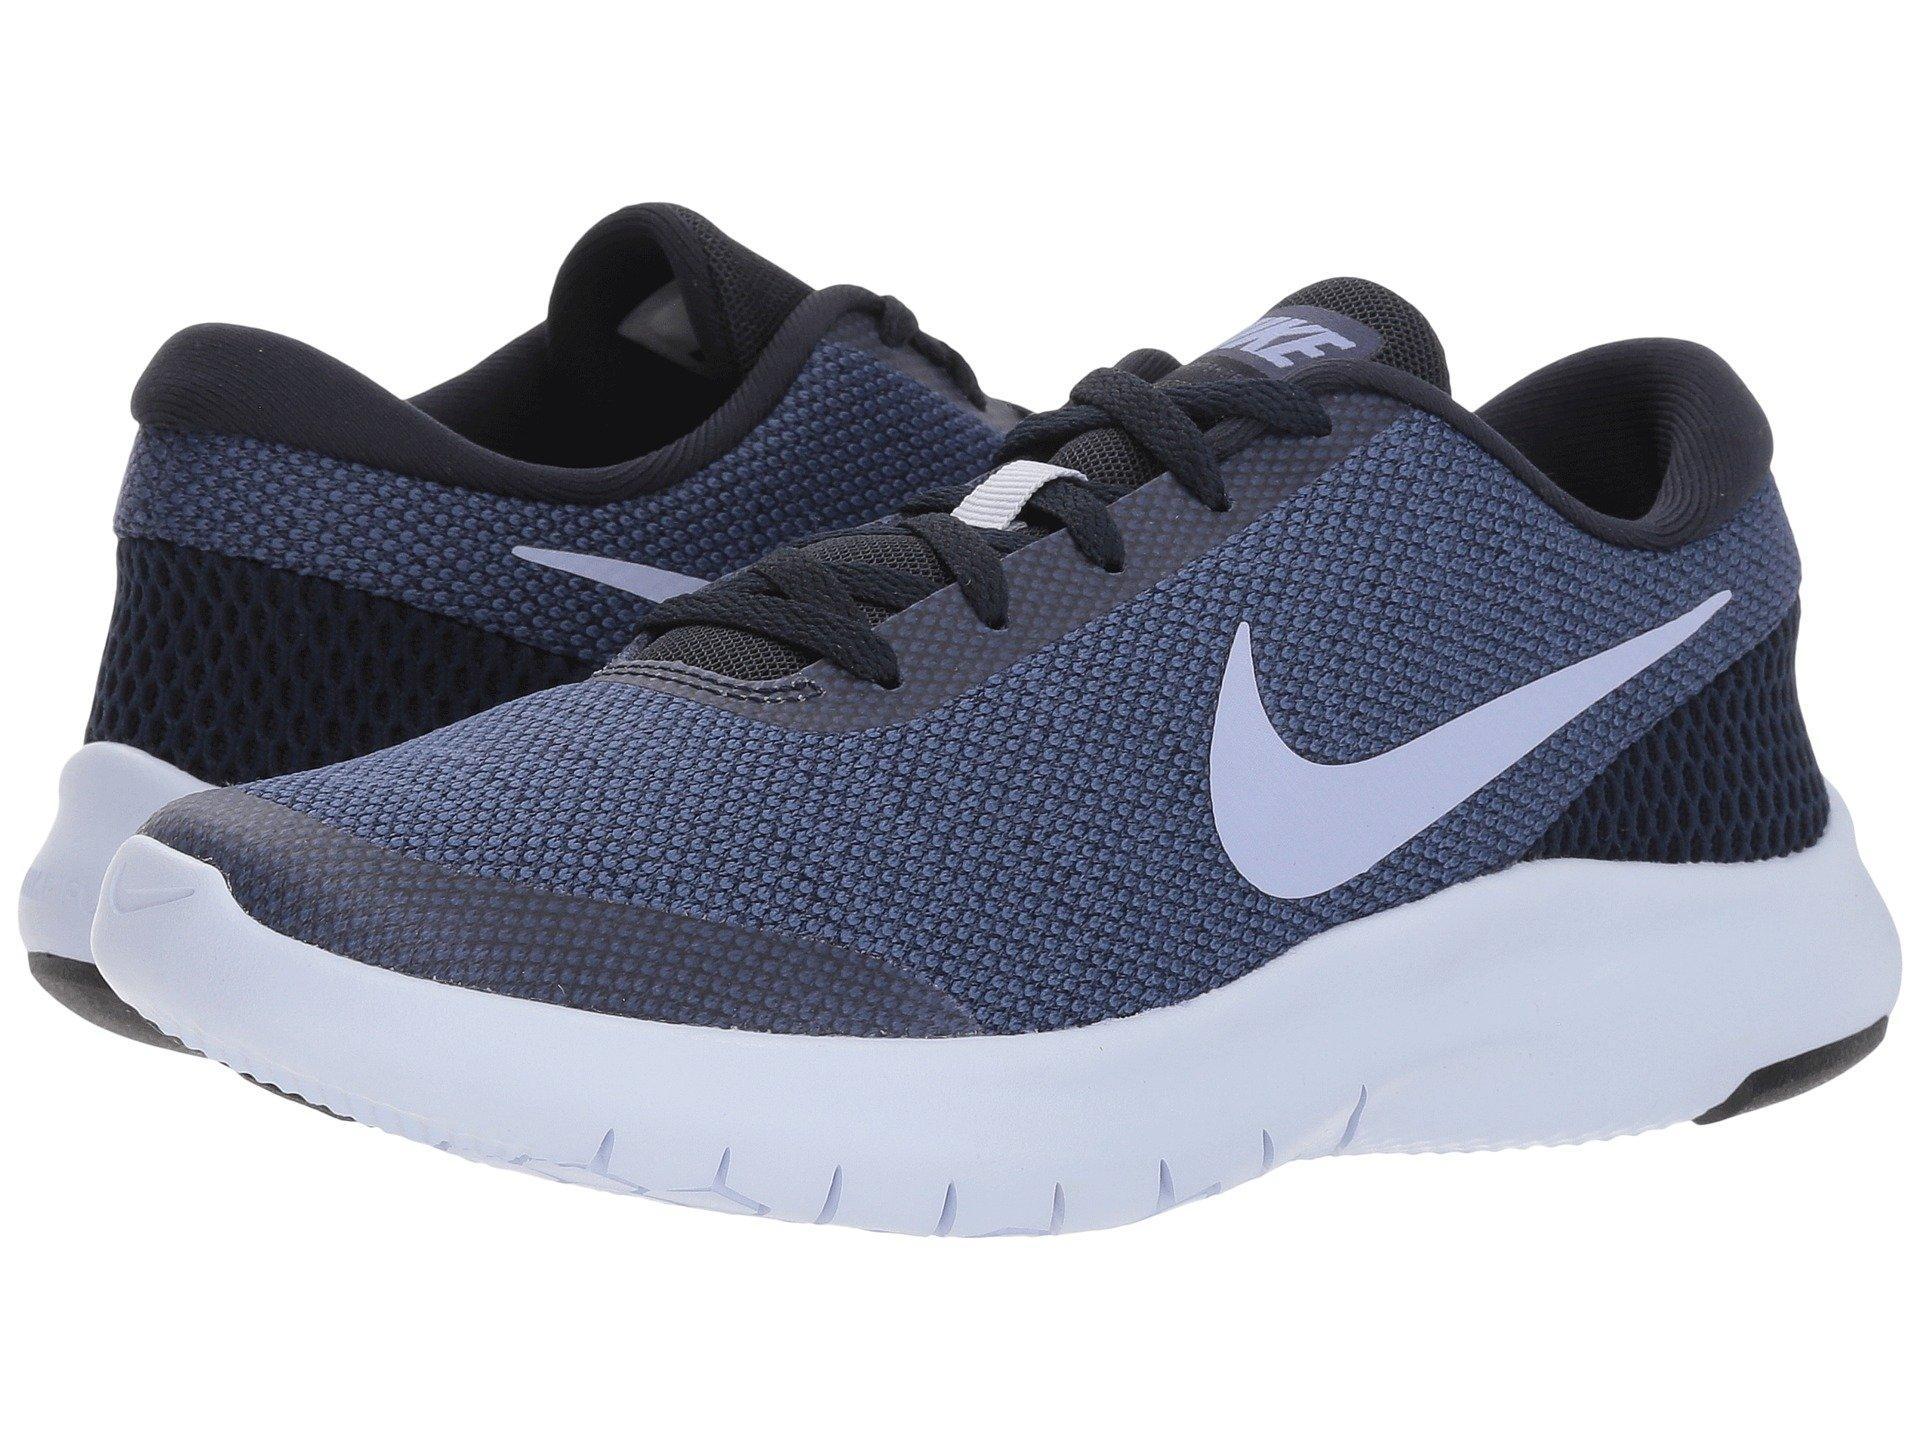 5ba0f2d20c35e Lyst - Nike Flex Experience Rn 7 in Blue